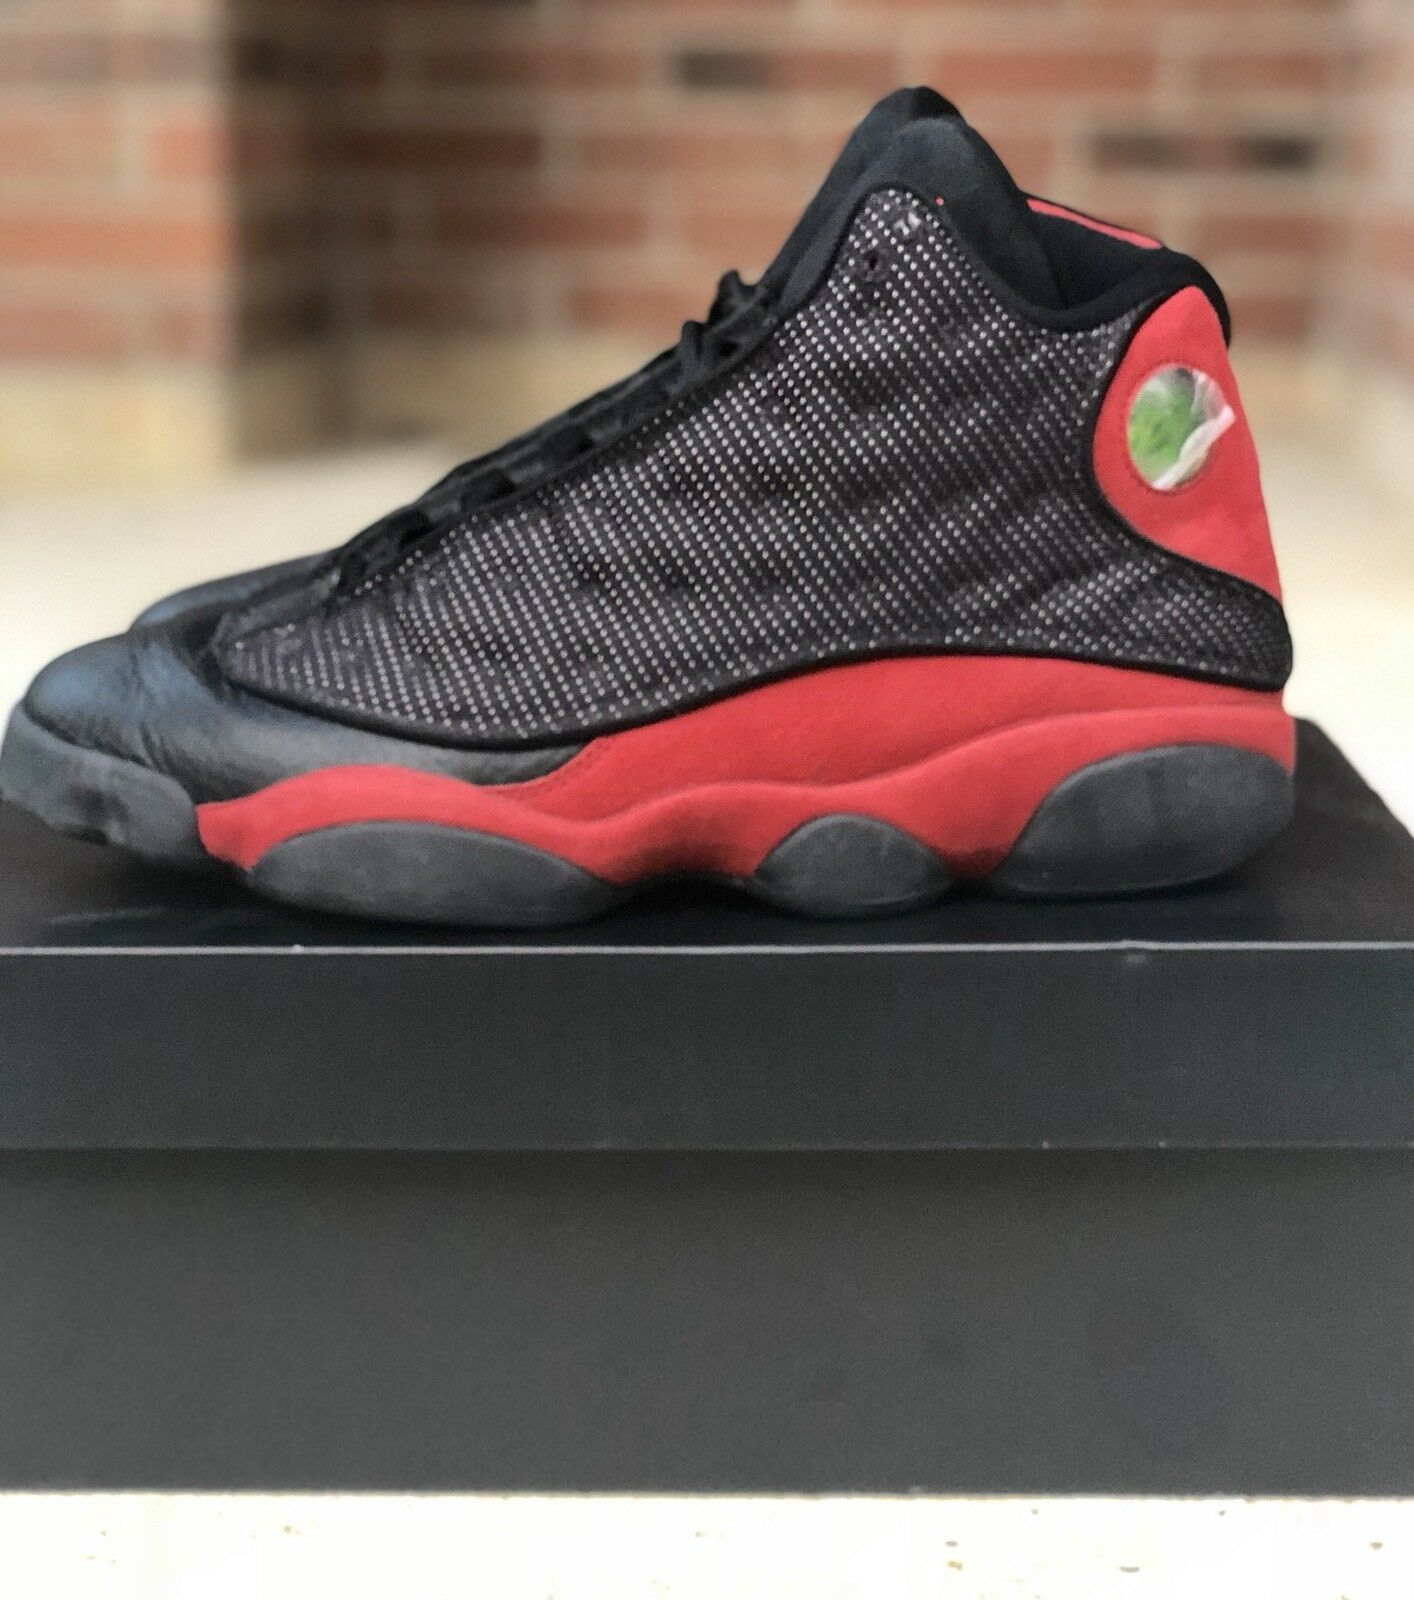 71d462dbb890f6 Nike Nike Nike AIR JORDAN 13 RETRO Black Red 8.5 80af7a - oxfords ...